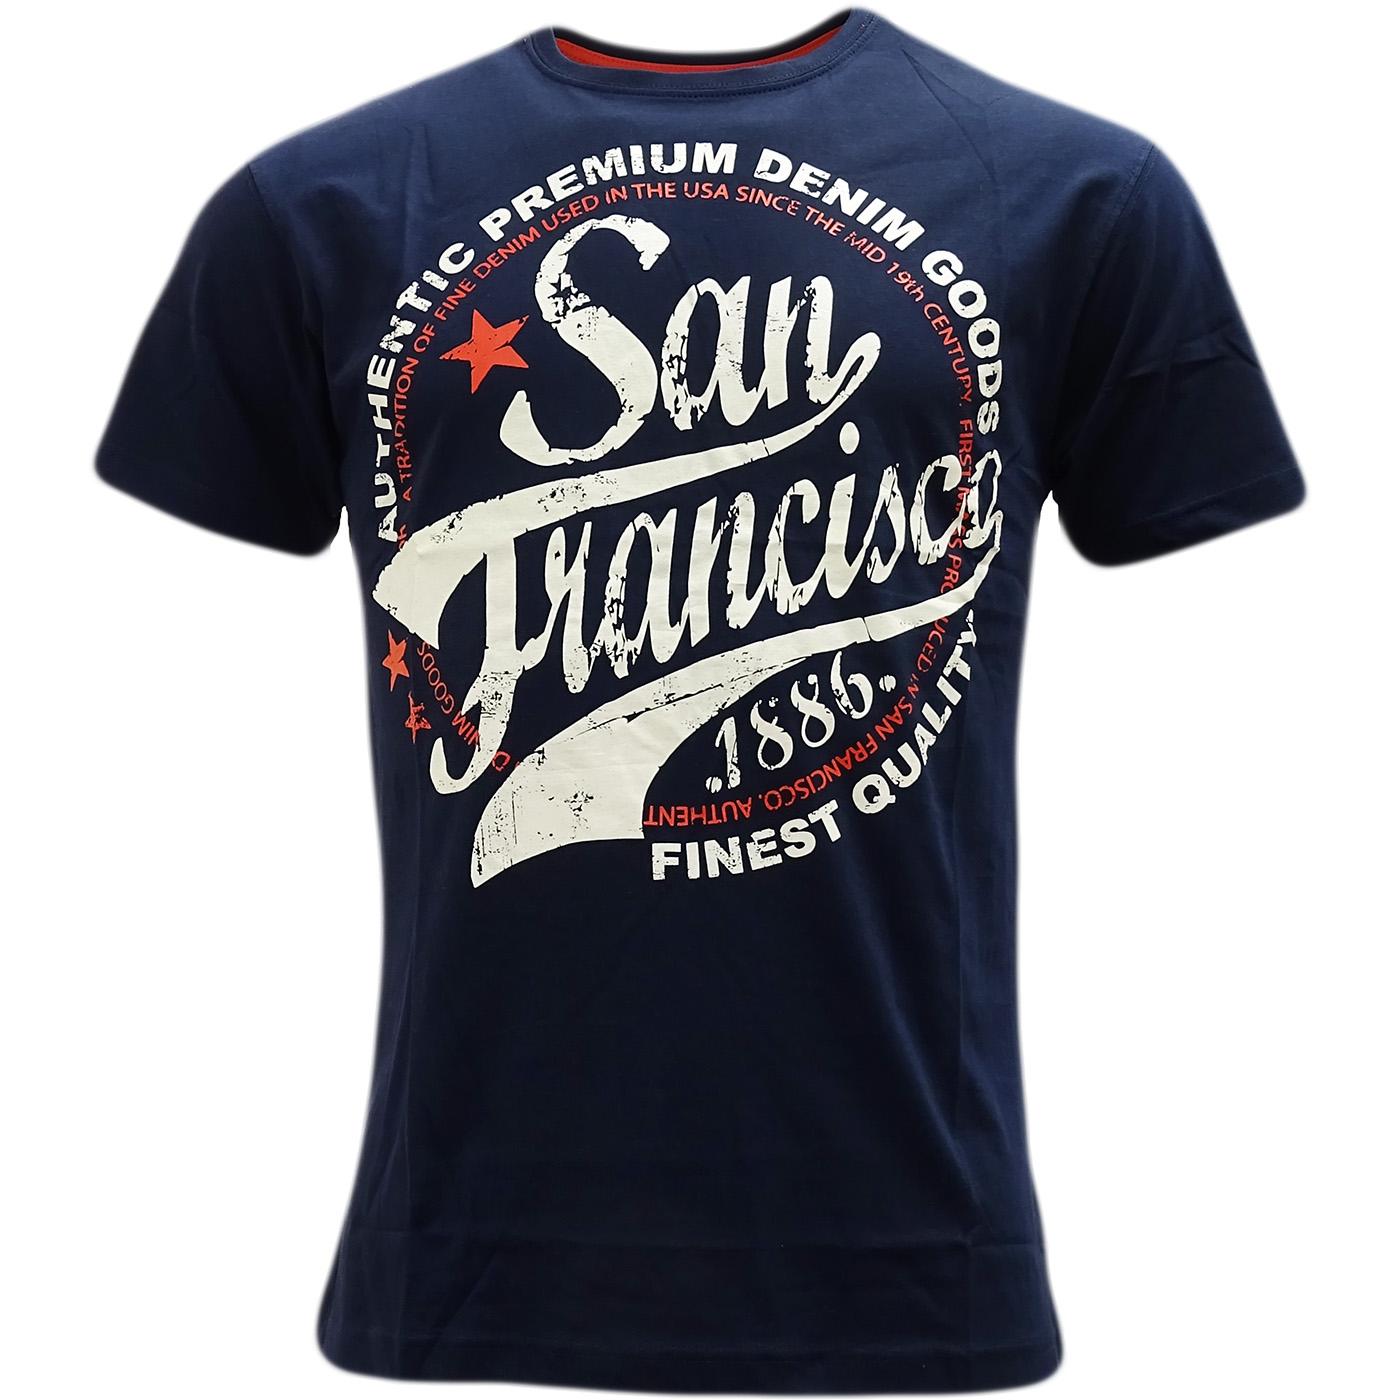 Cargo designer top t shirt san francisco ebay for Bespoke shirts san francisco